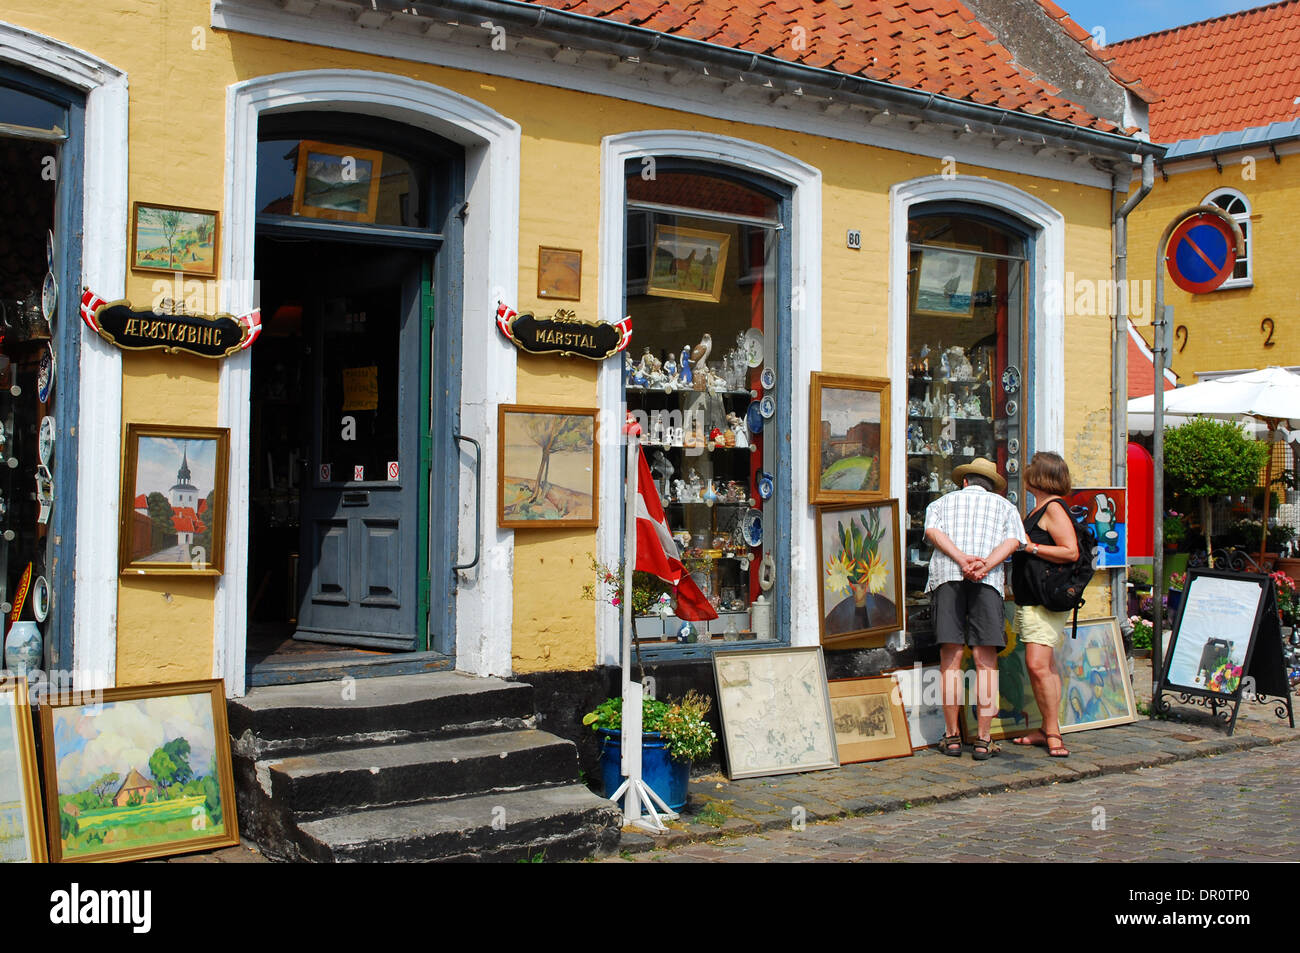 Aero island, Aeroskobing, Antique shop, Fyn, Denmark, Scandinavia, Europe - Stock Image